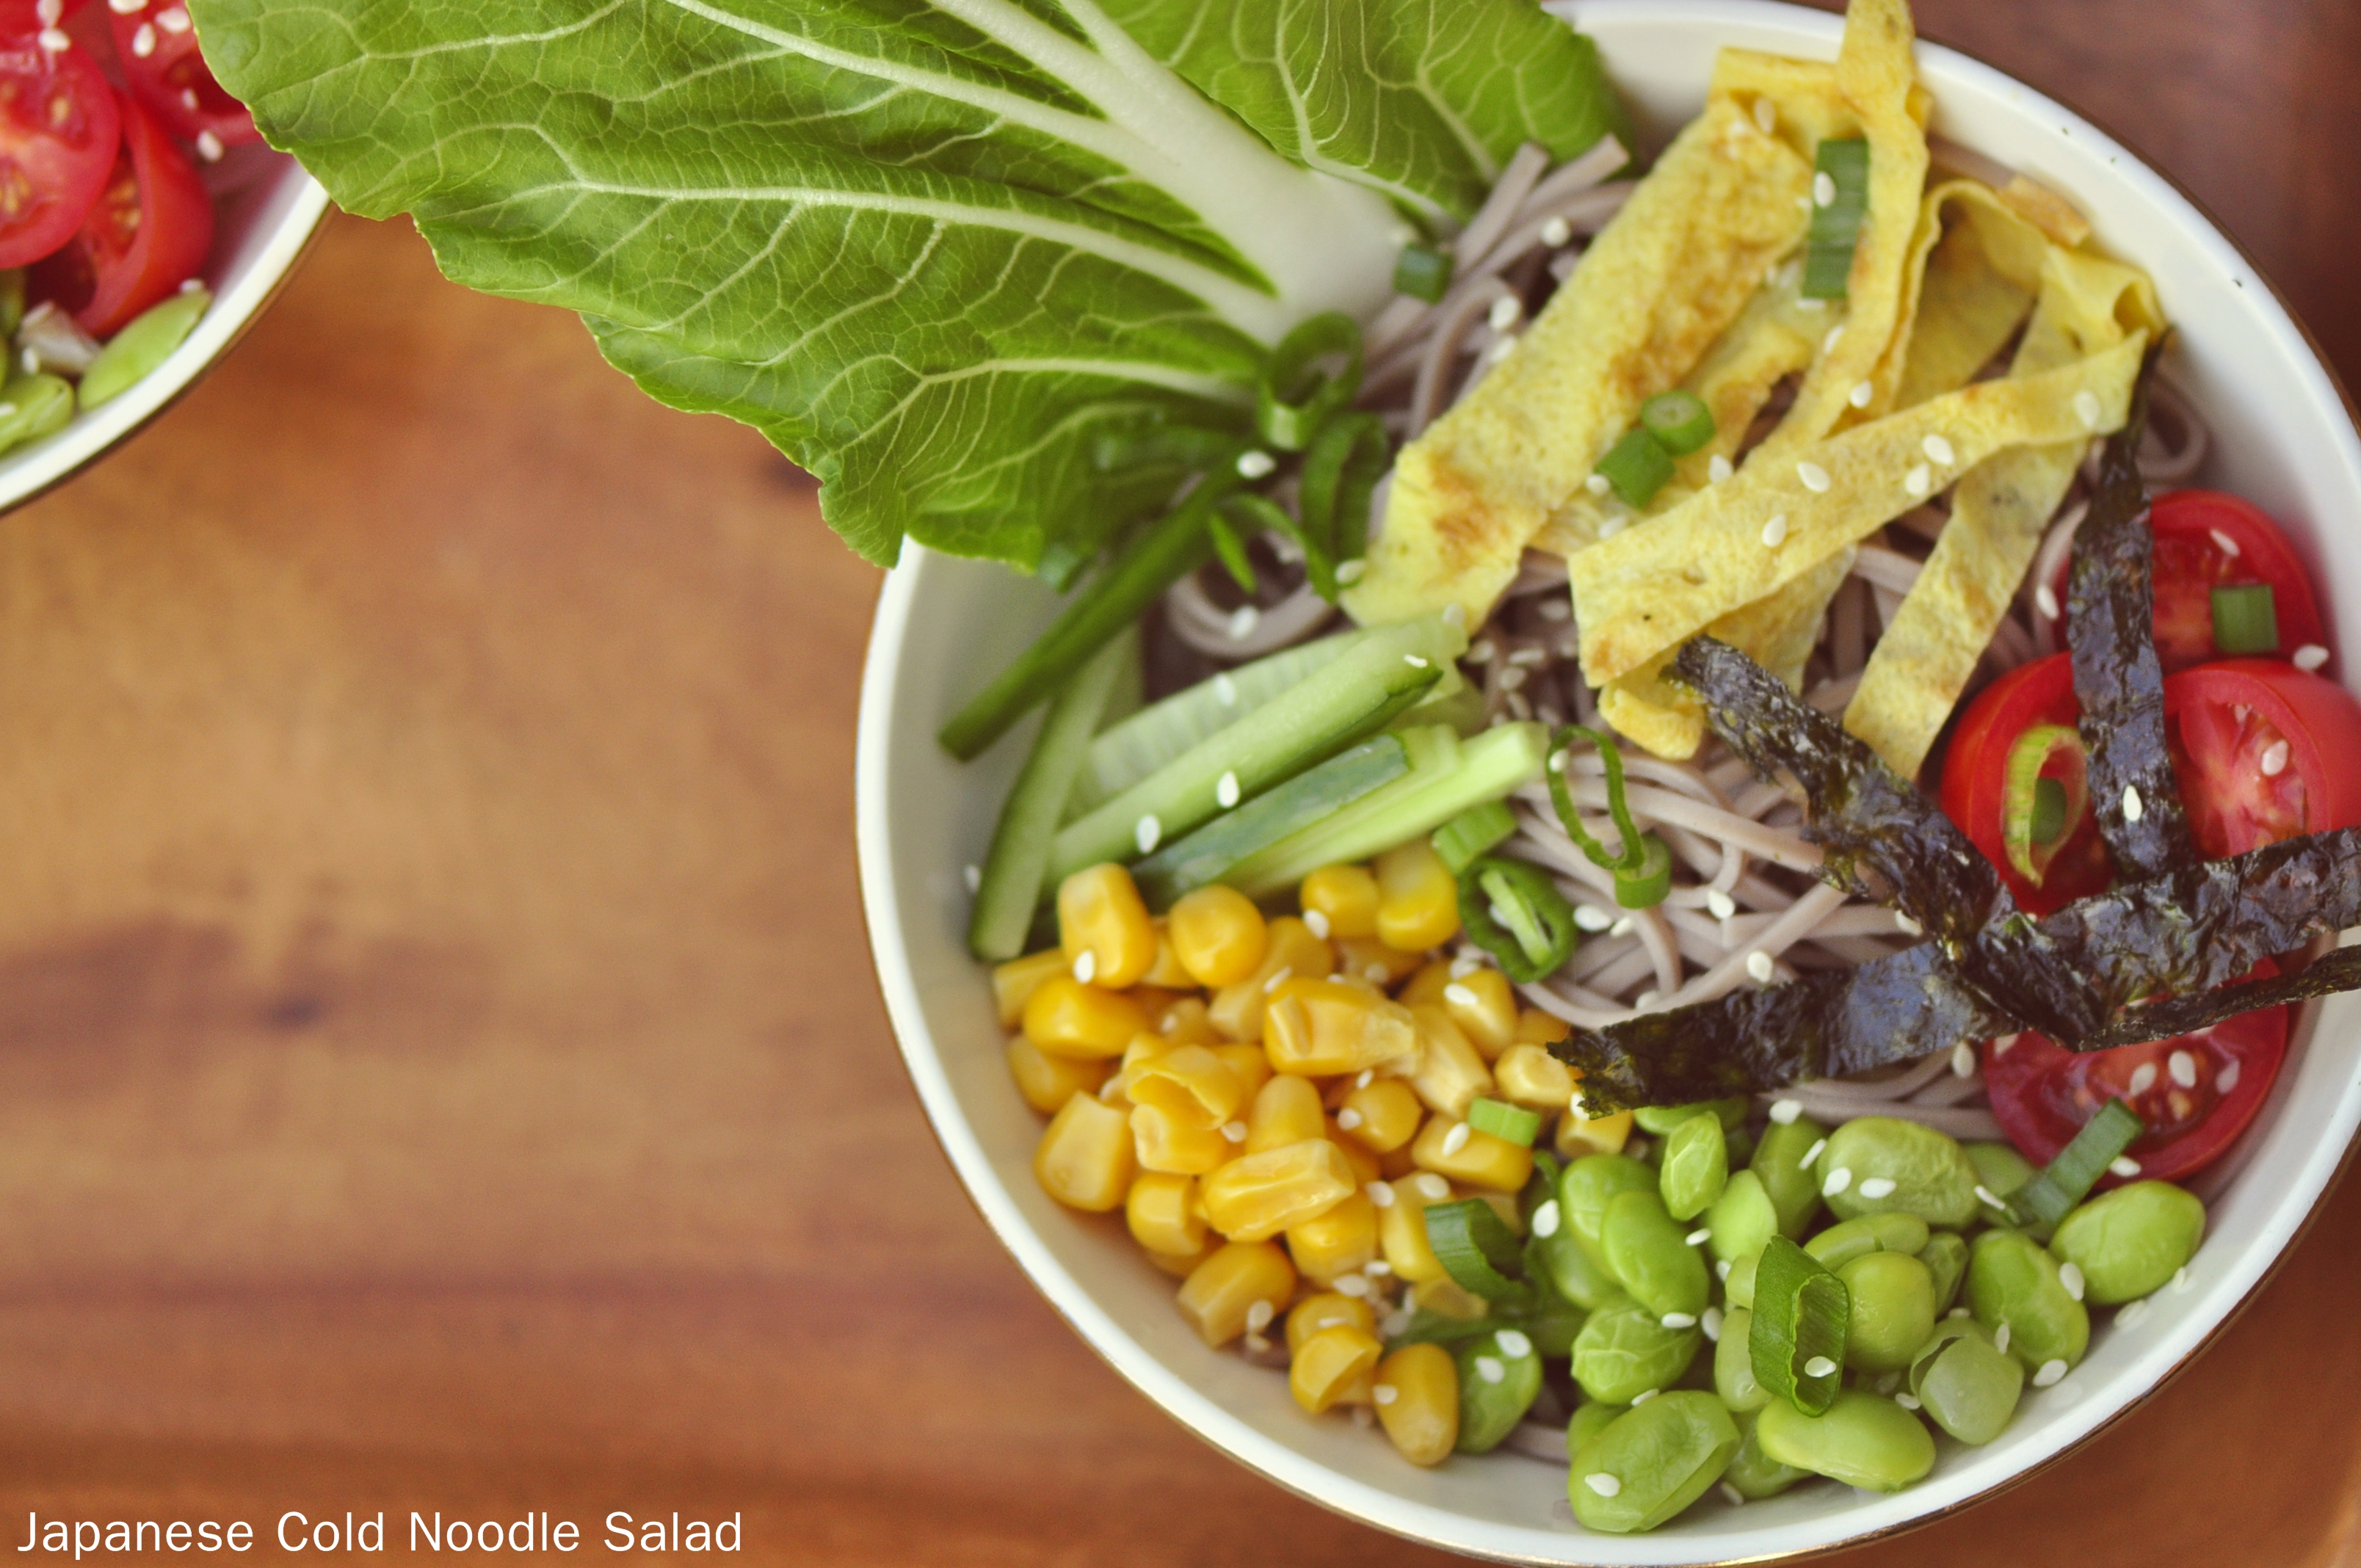 Japanese Cold Noodle Salad (Hiyashi Chuka) | the vegetarian ginger